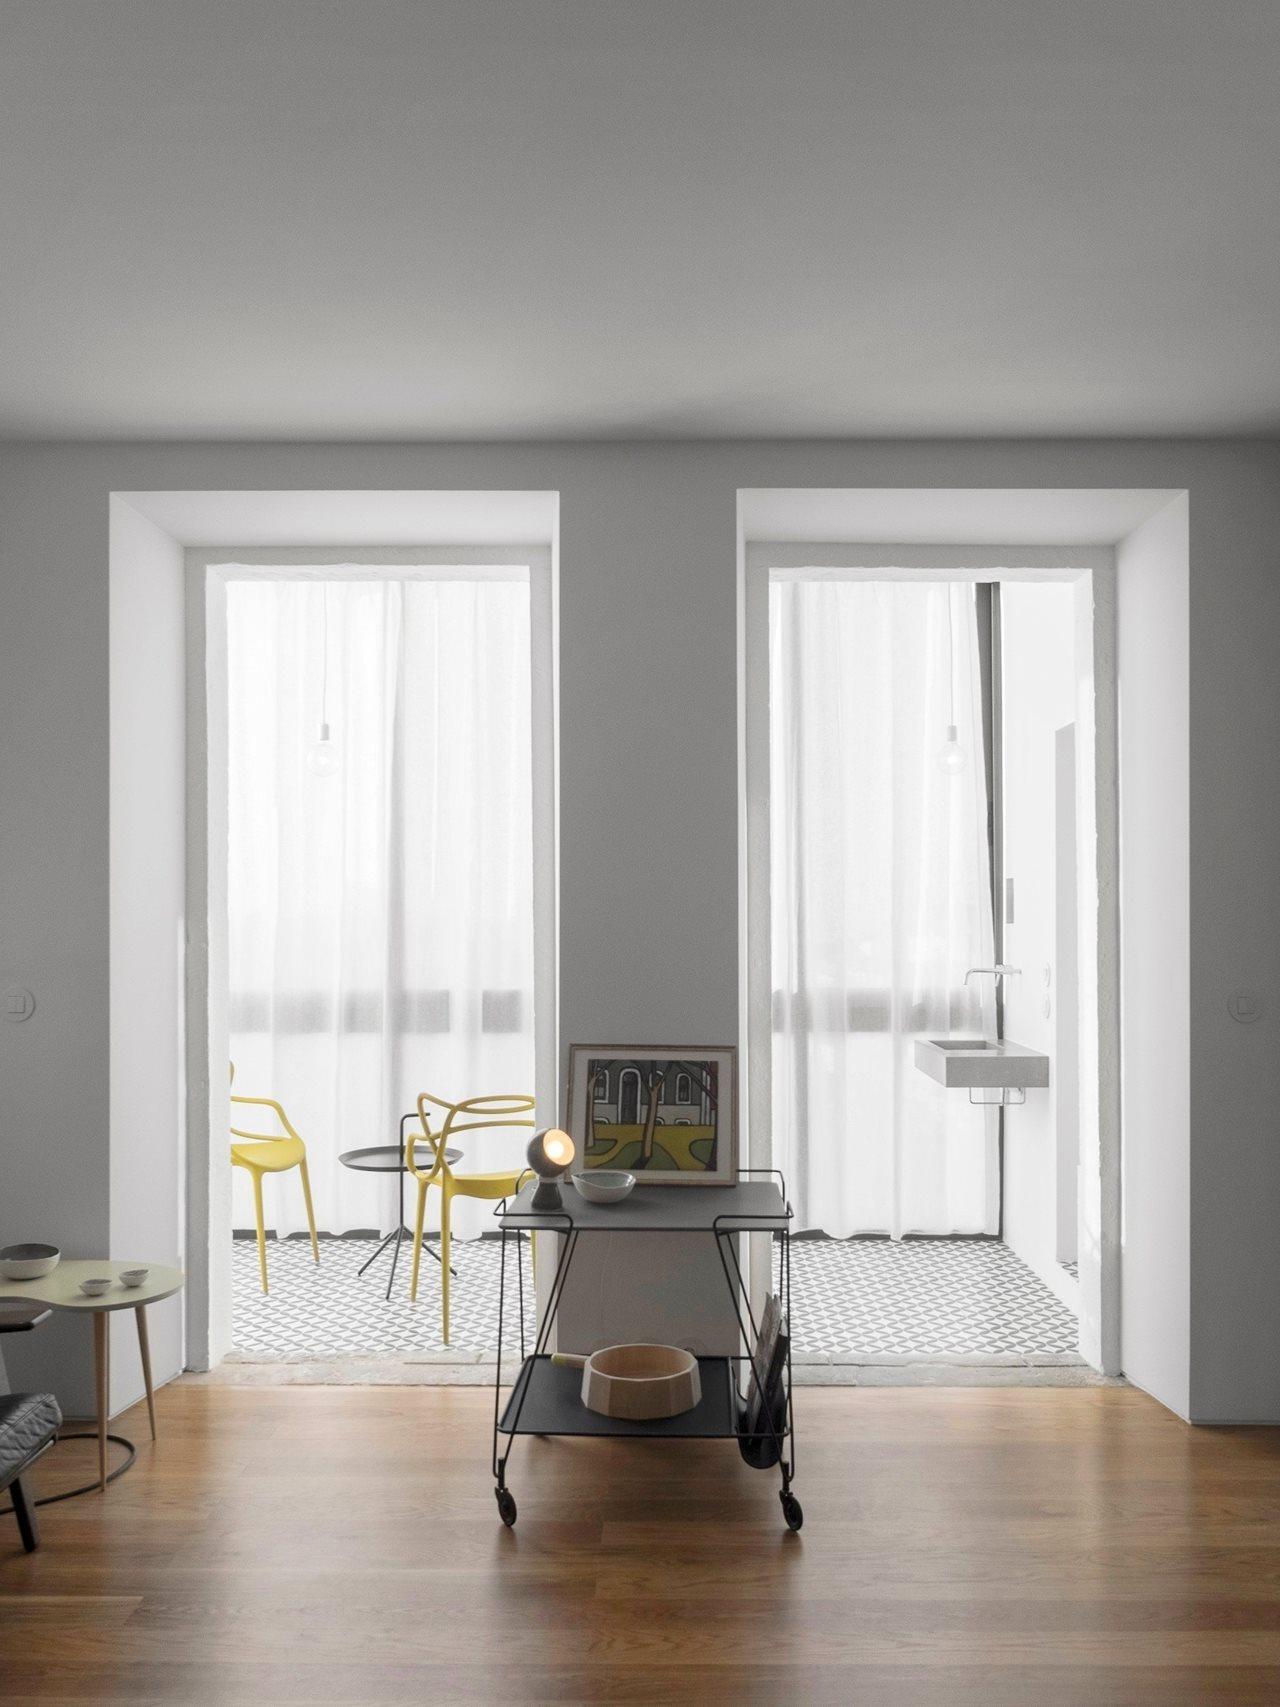 Apartment Renovation In Manhattan: Old Apartment Renovation In Lisbon